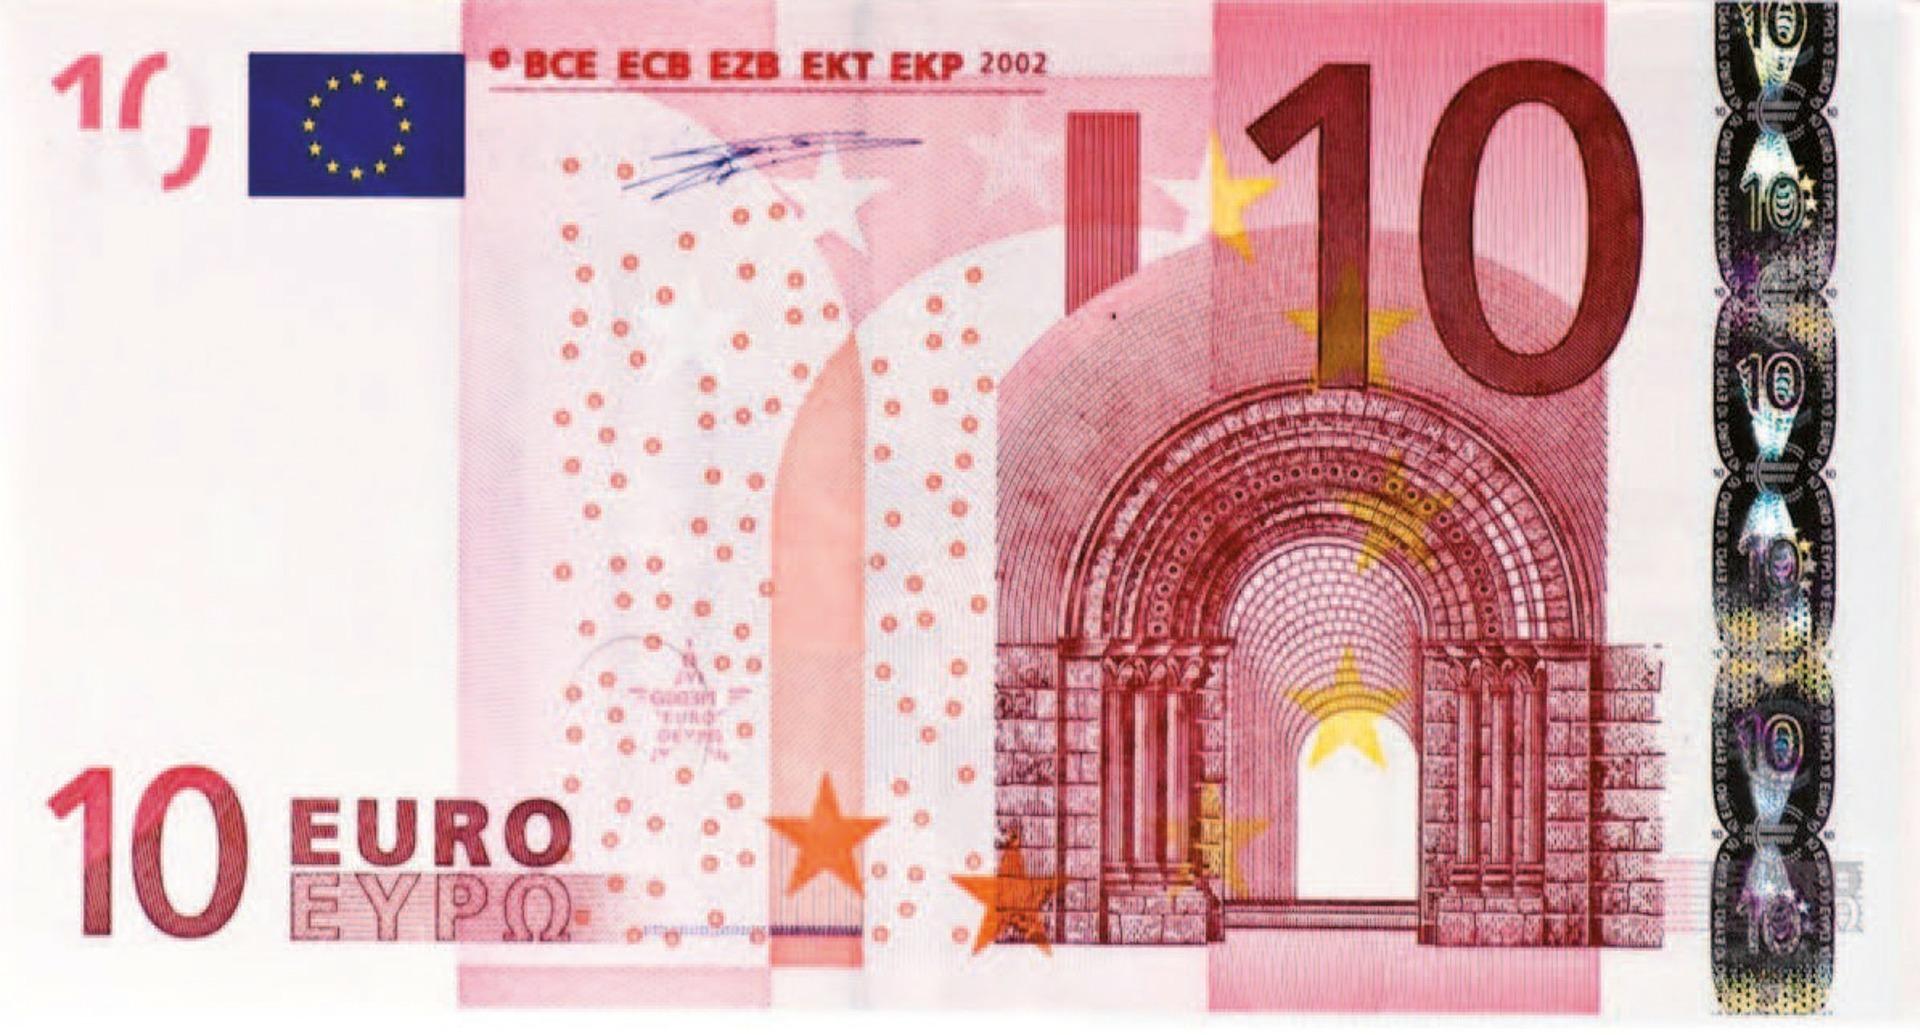 loopbaanbegeleiding rijkevorsel vanaf 10 euro per uur